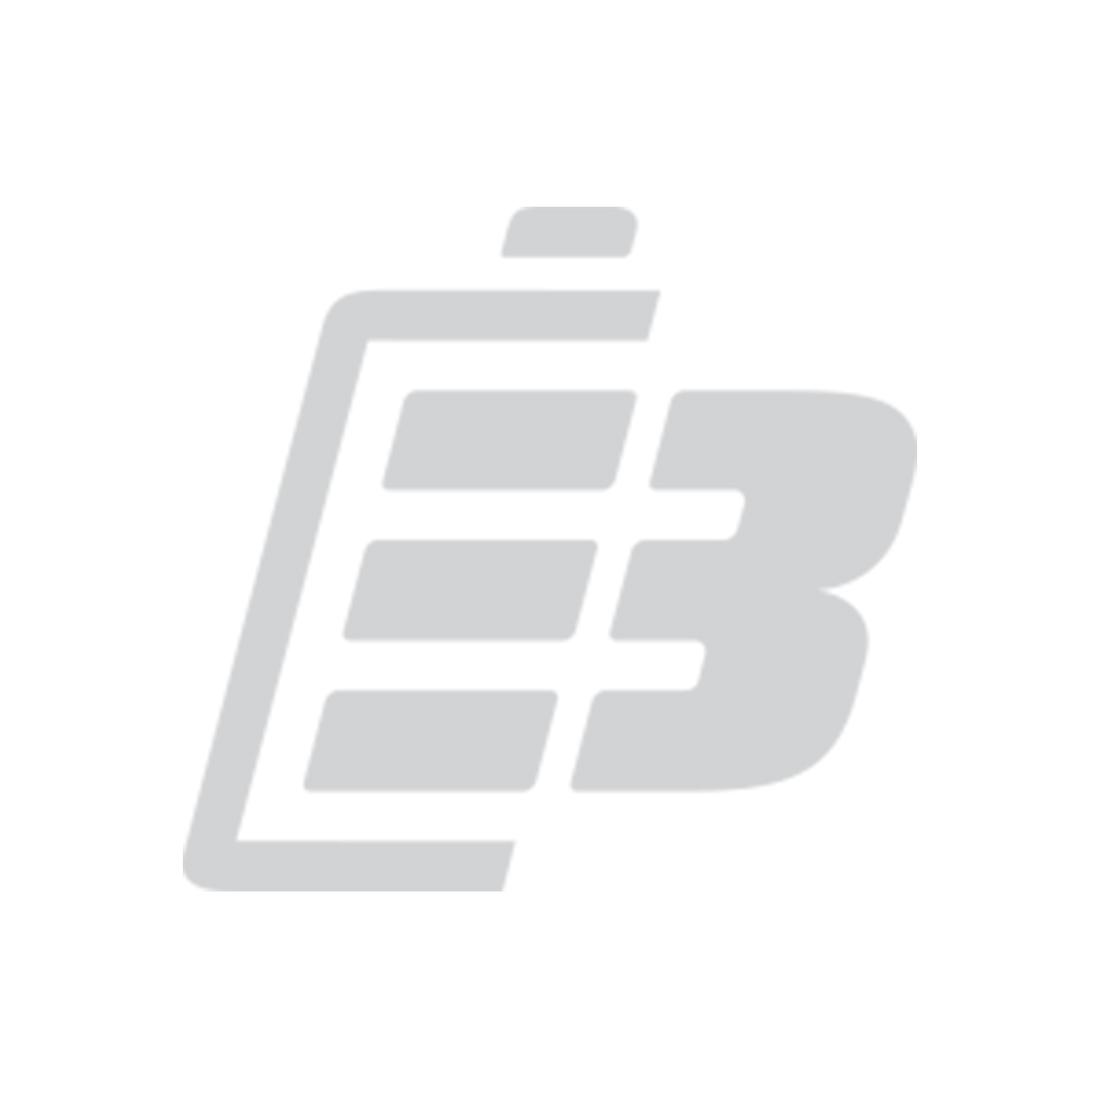 Fenix E02R Keychain light blue